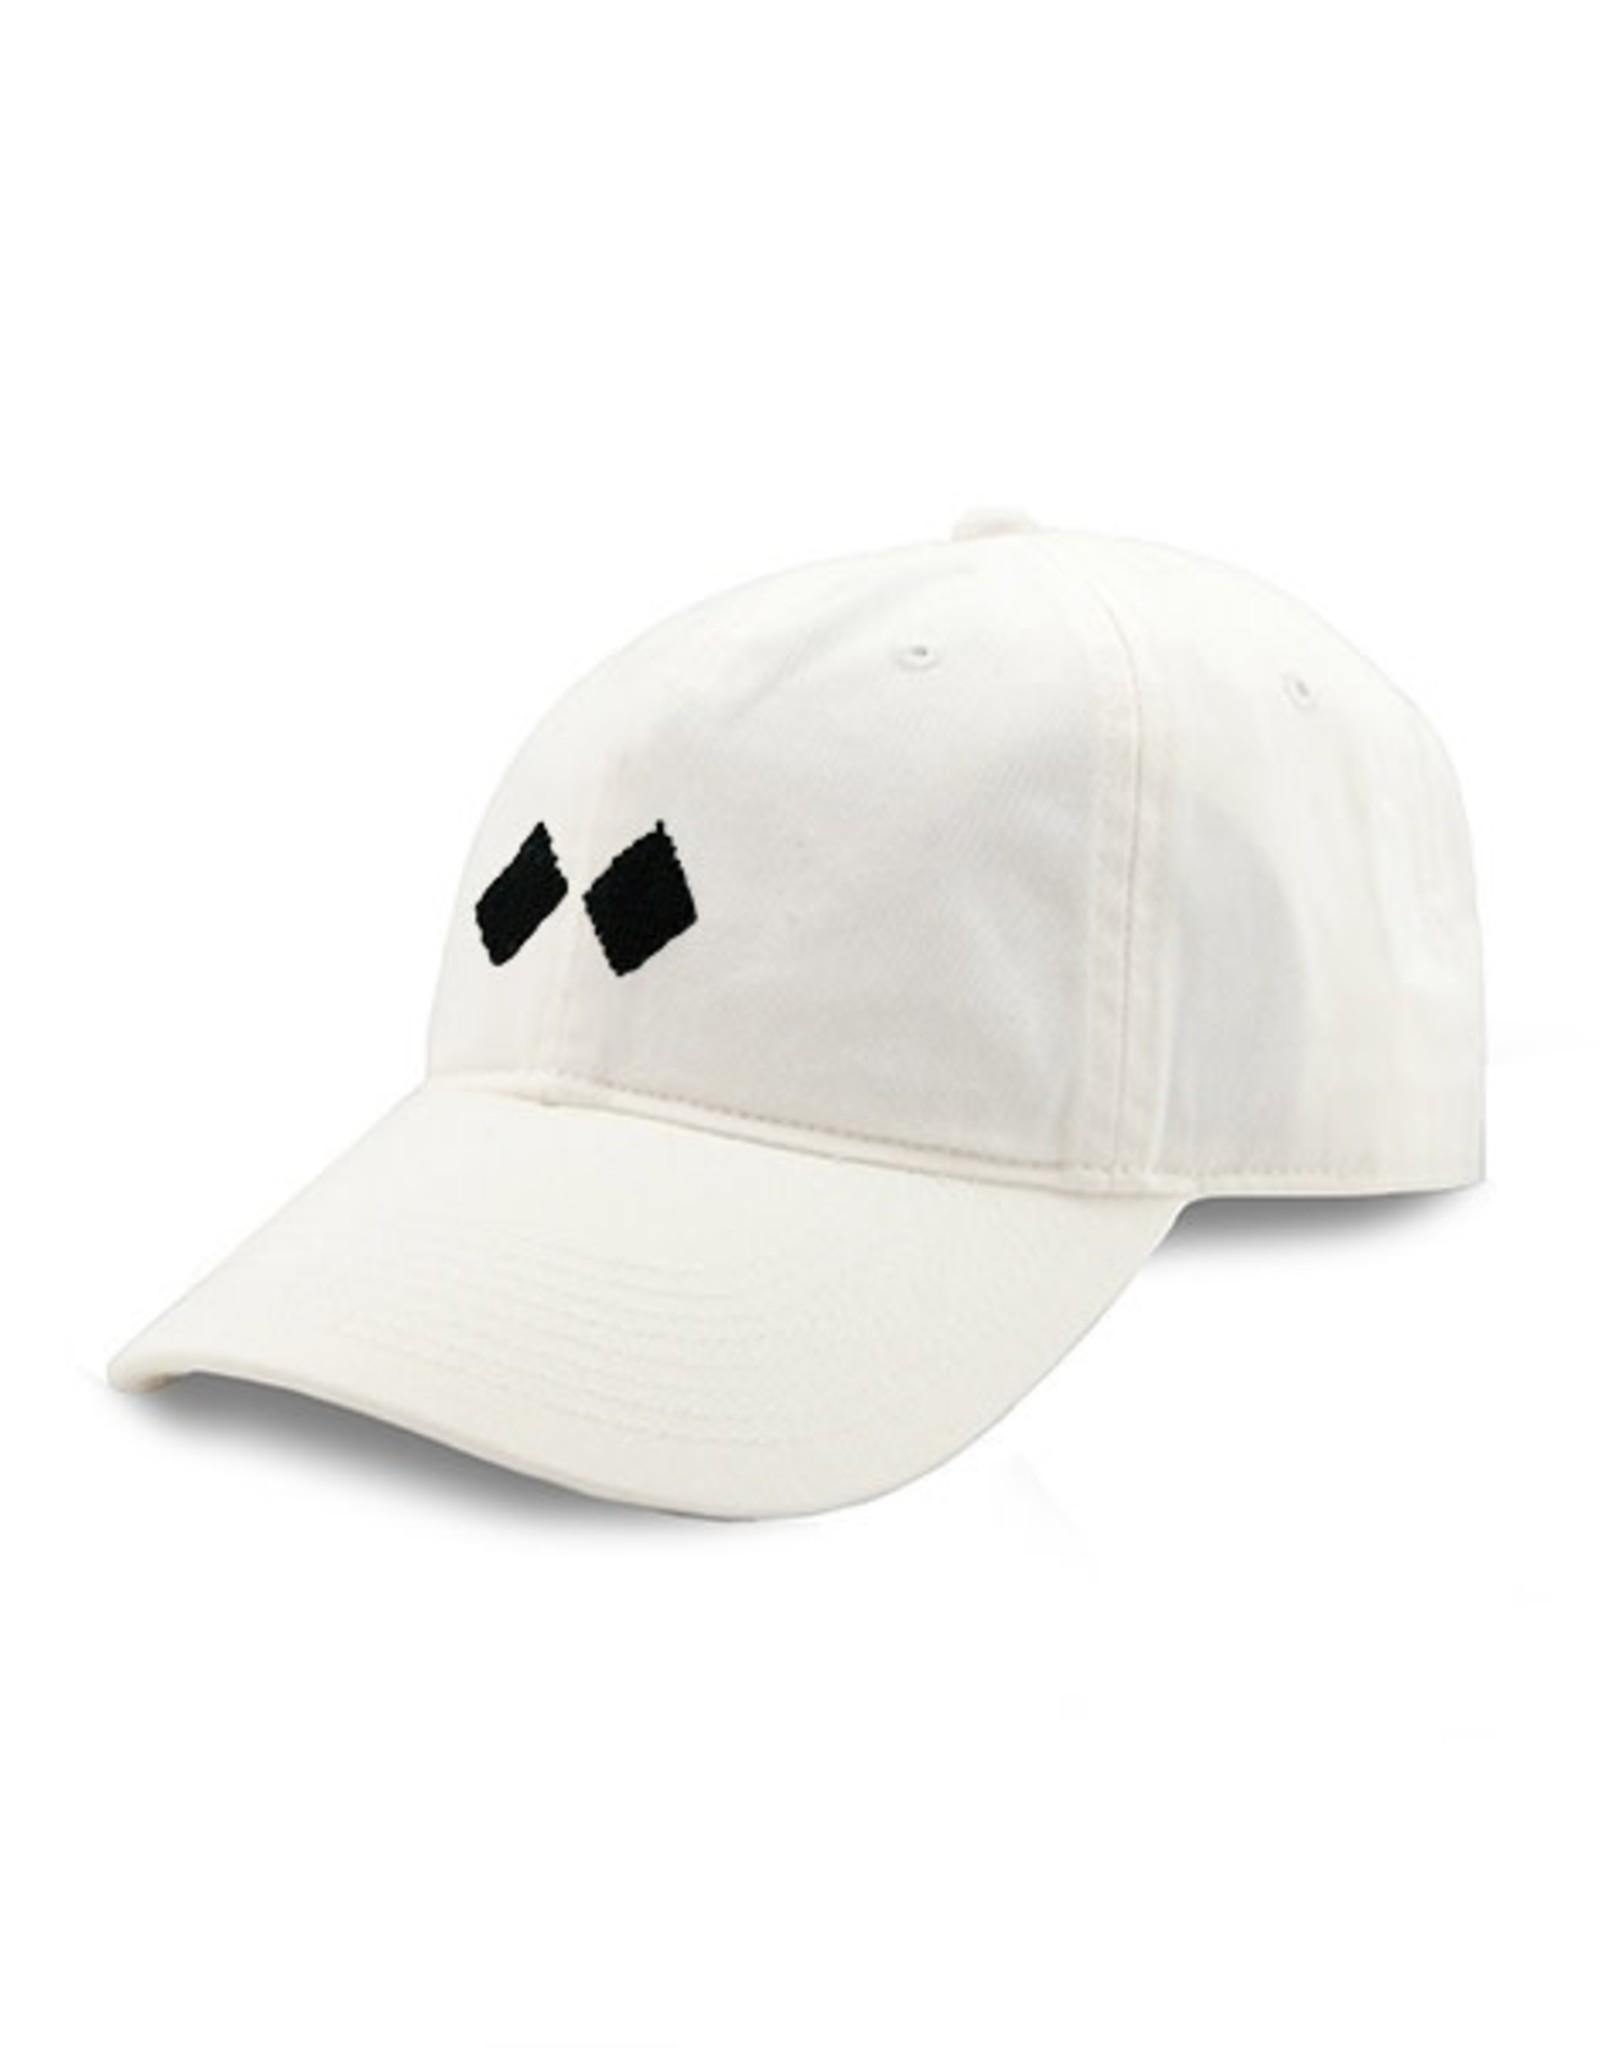 Smather's & Branson Hat Double Black Diamond White